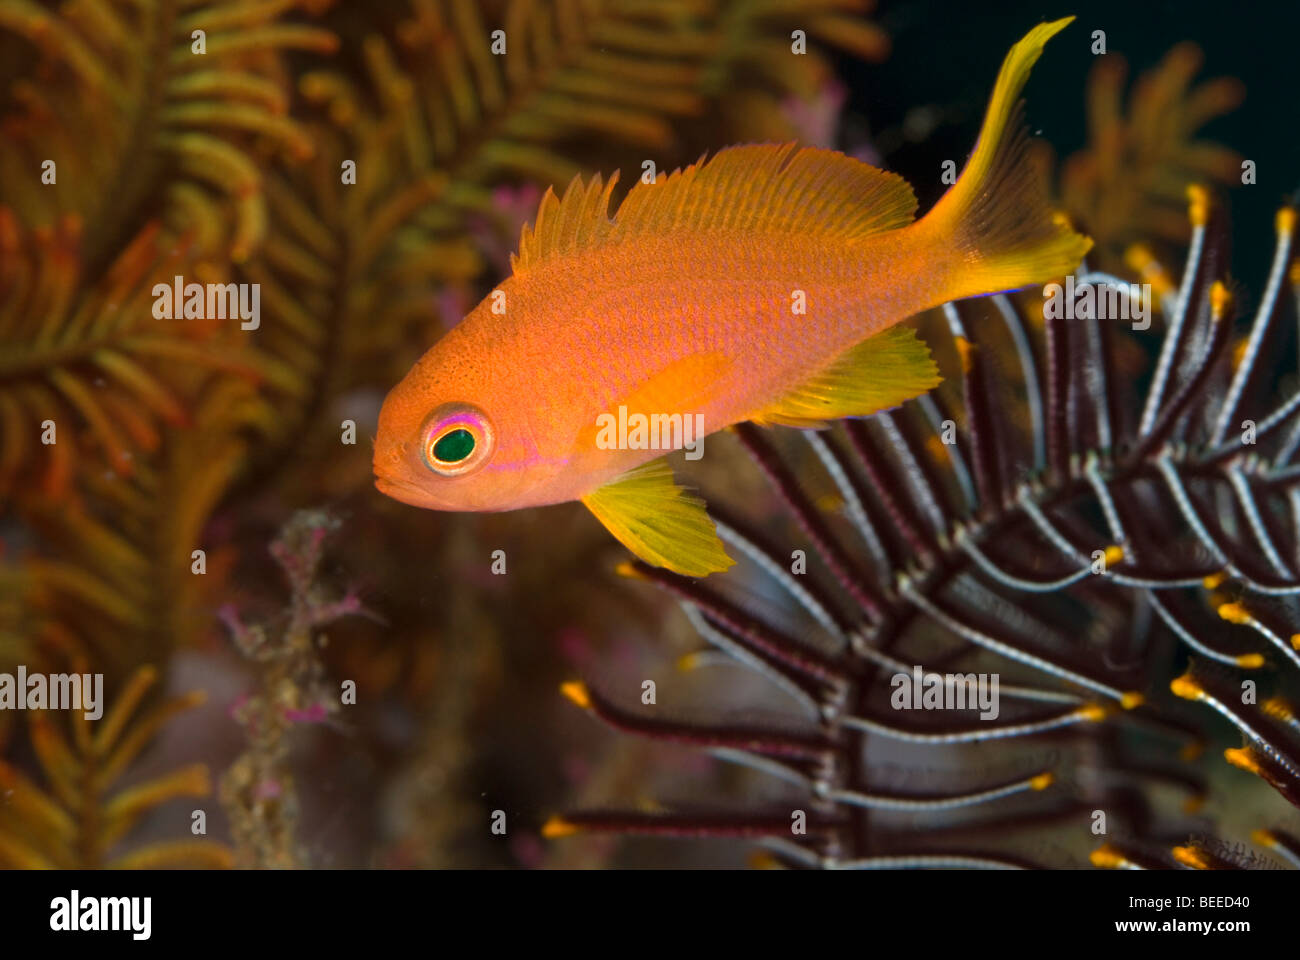 Scalefin anthias under water. - Stock Image